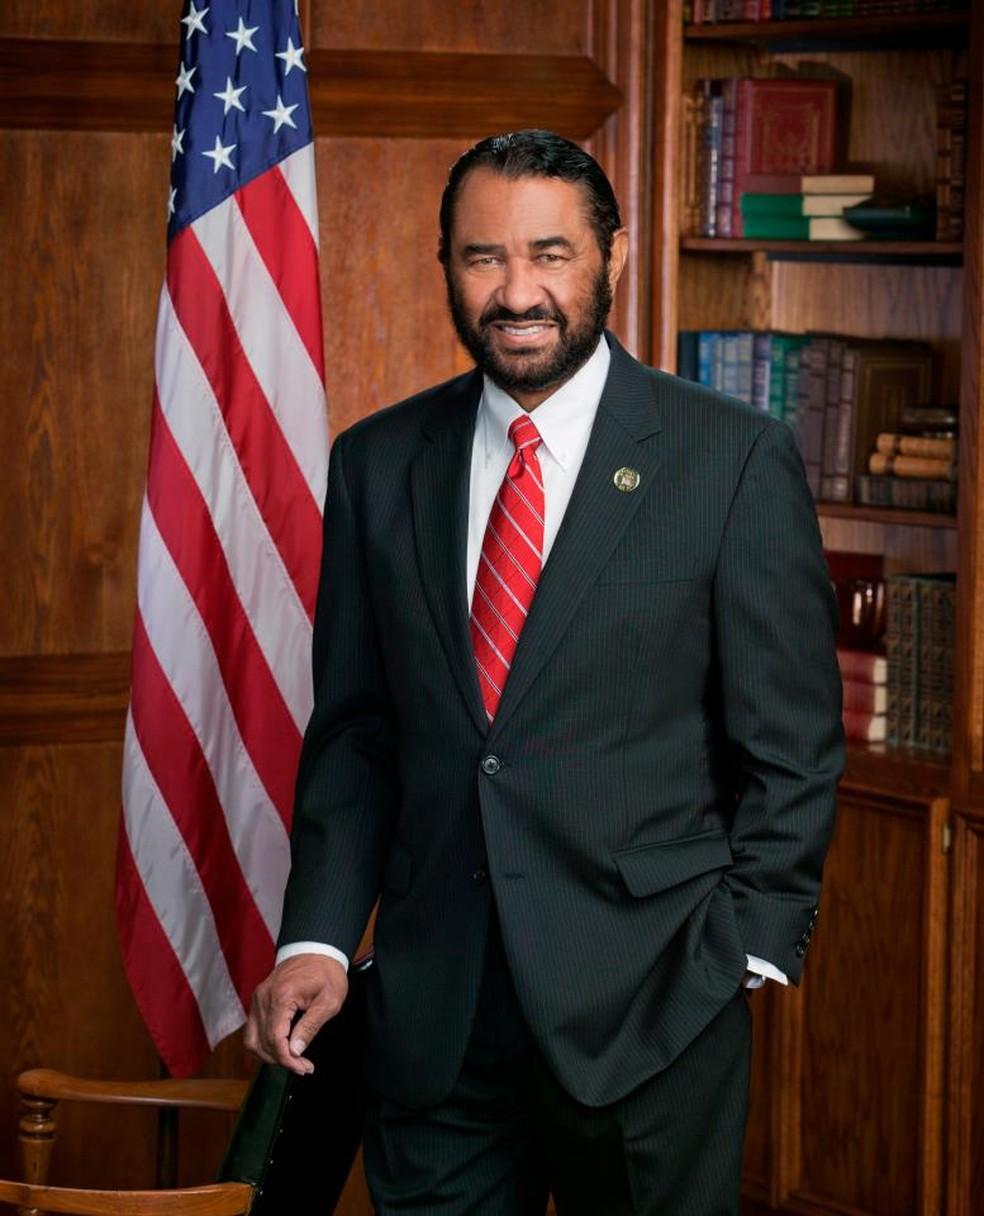 O congressista do Texas Al Green. — Foto: Reprodução/Facebook Al Green